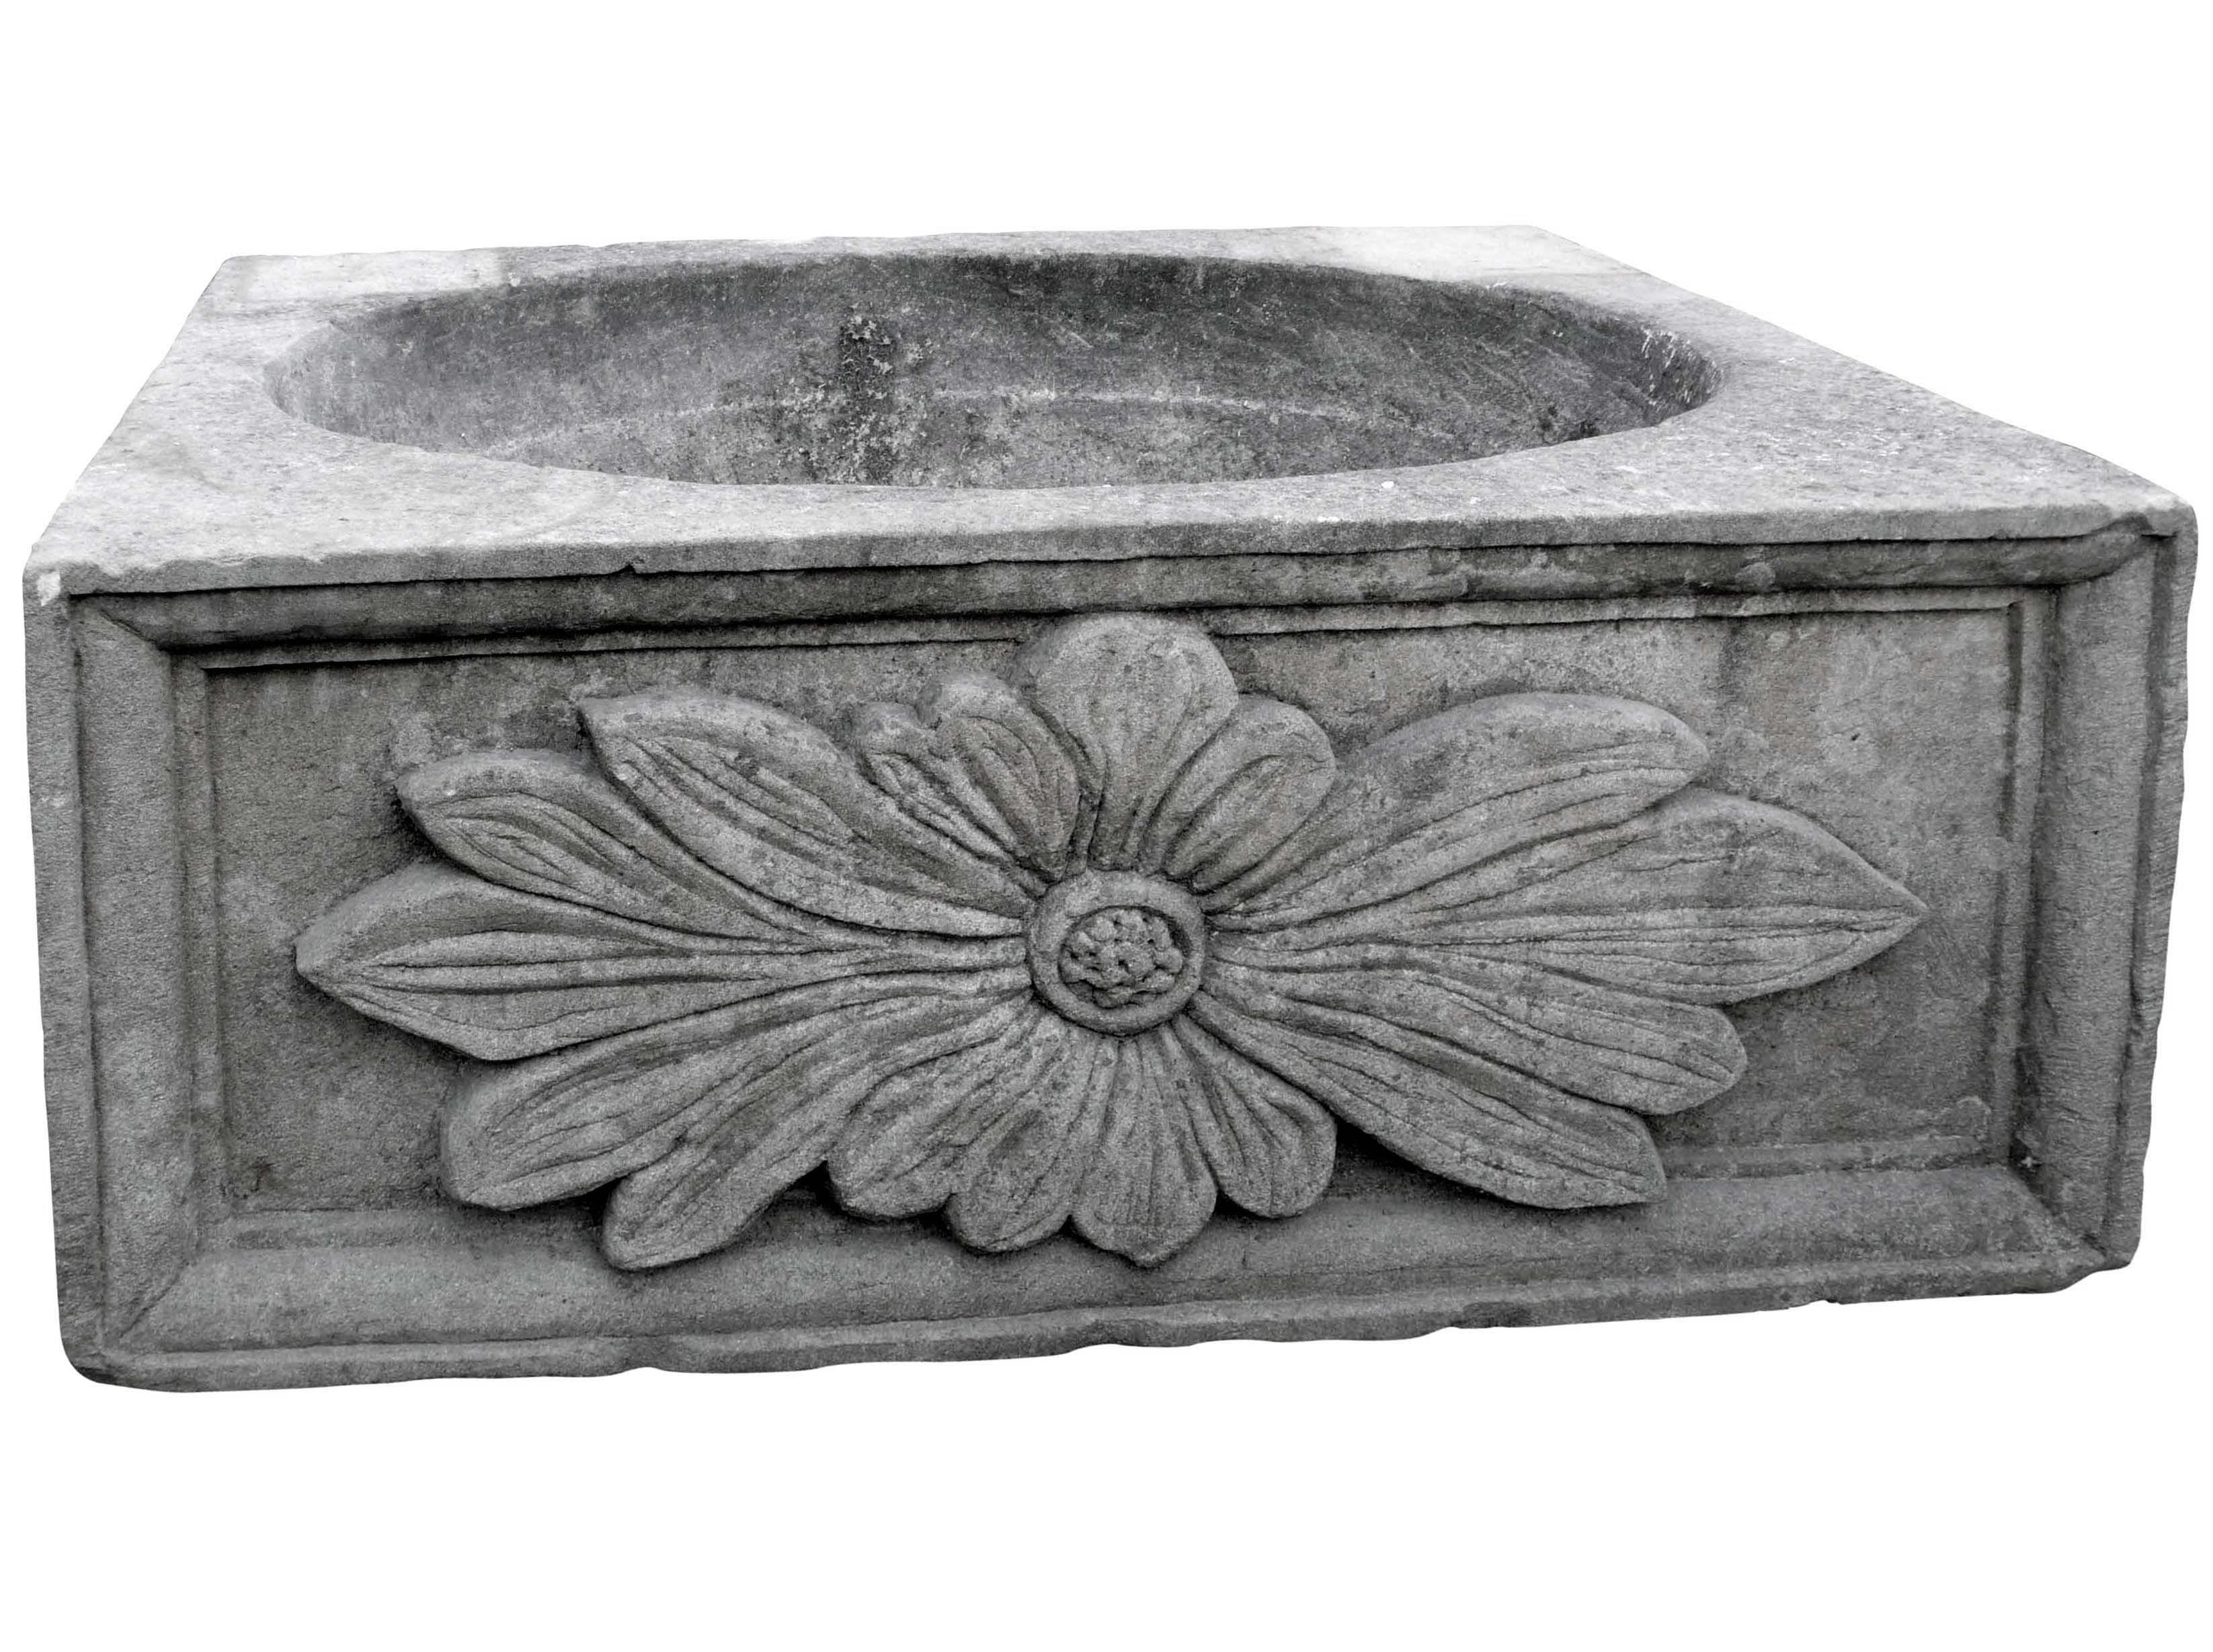 Vasca Giardino Pietra : Vasca da giardino recuperando